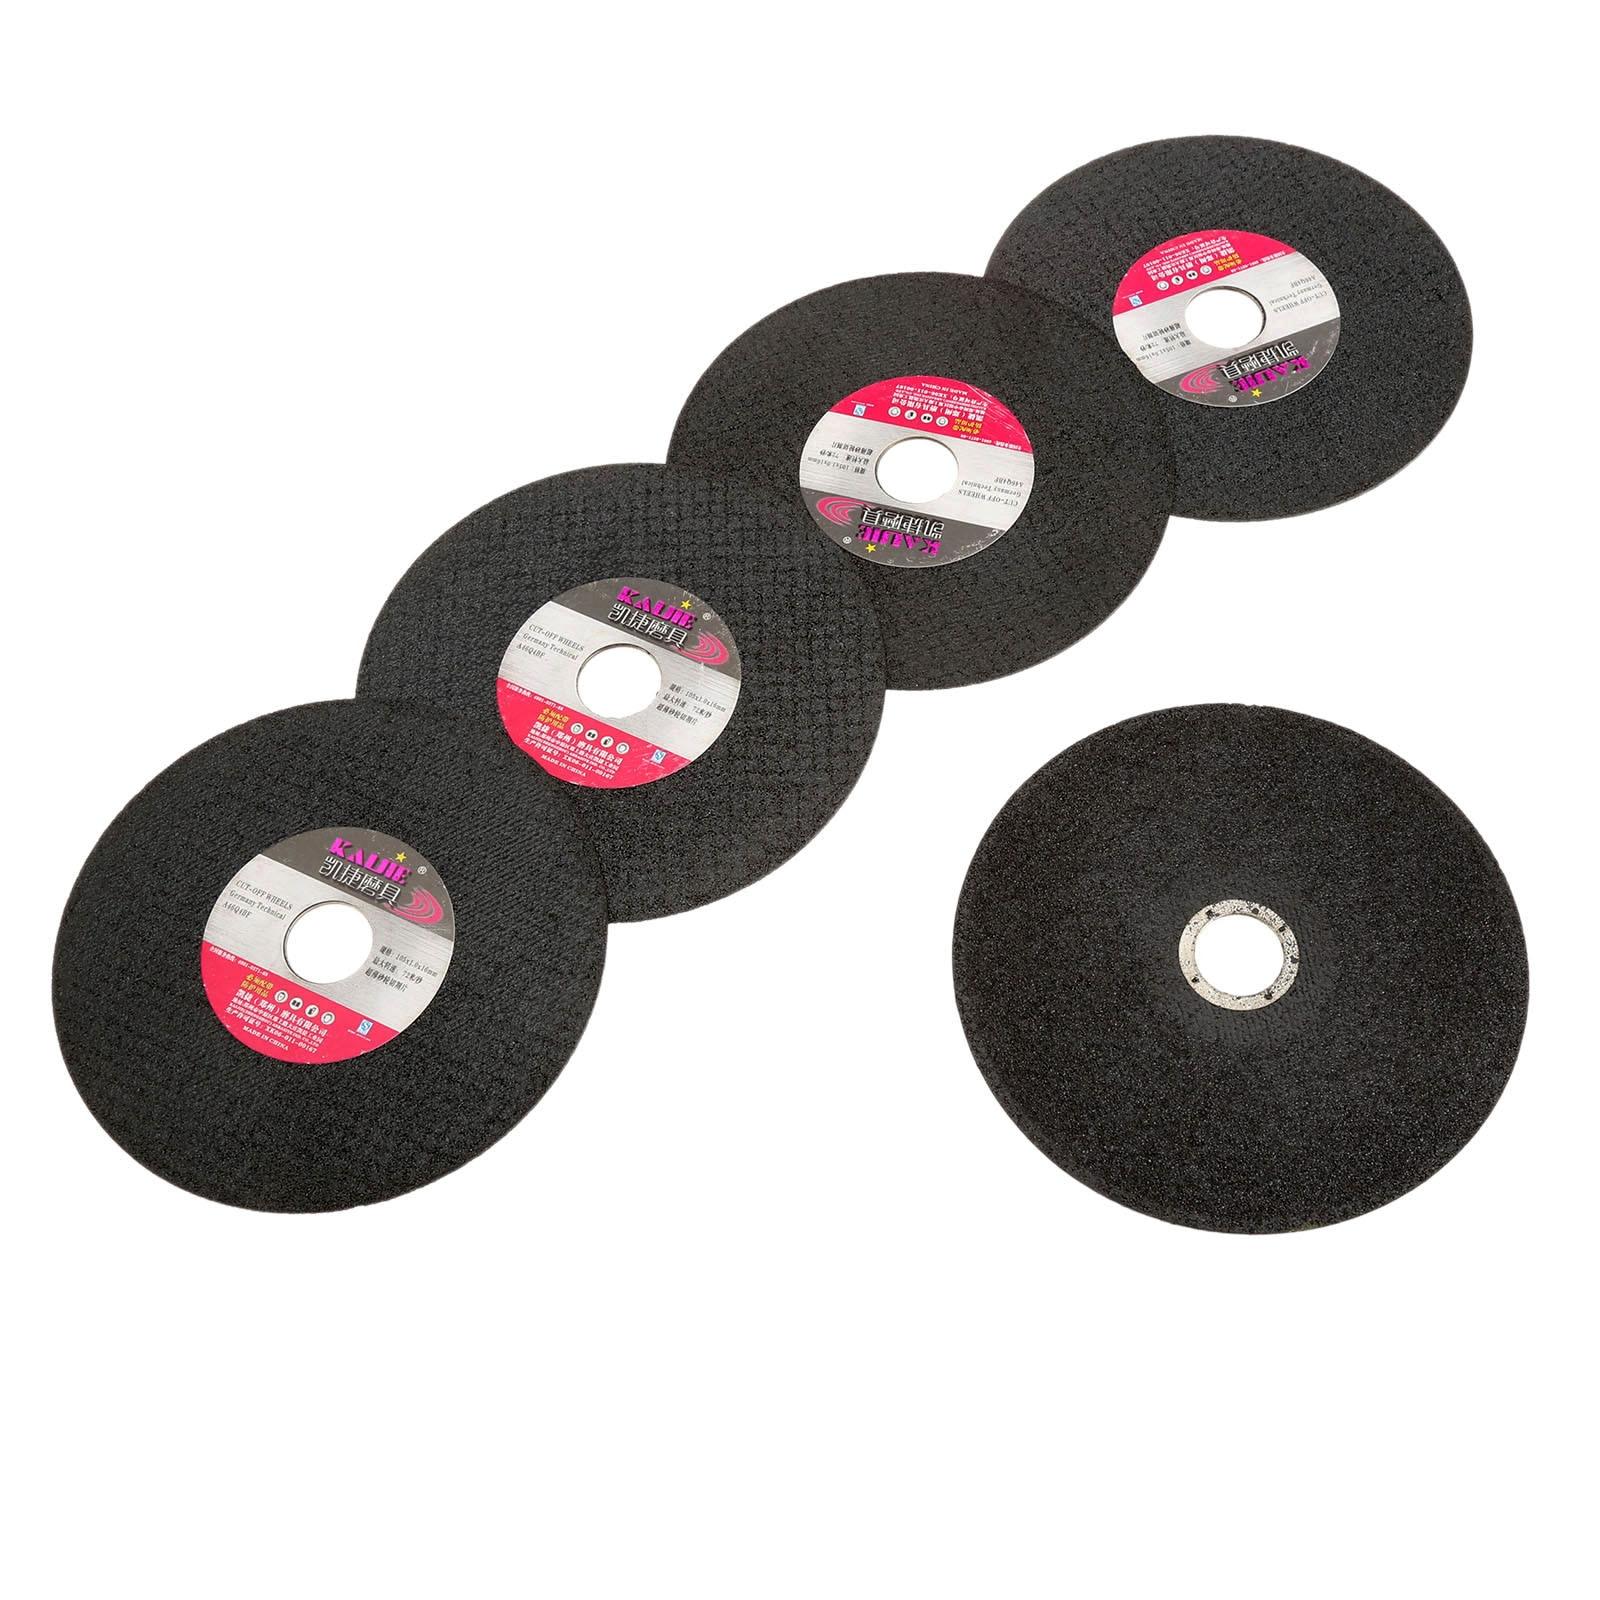 5Pcs Dremel Accesories Cutting Wheel 105mm Resin Grinding Wheel Cut Off Cutter Abrasive Disc Cutting Disc For Metal Wood Steel